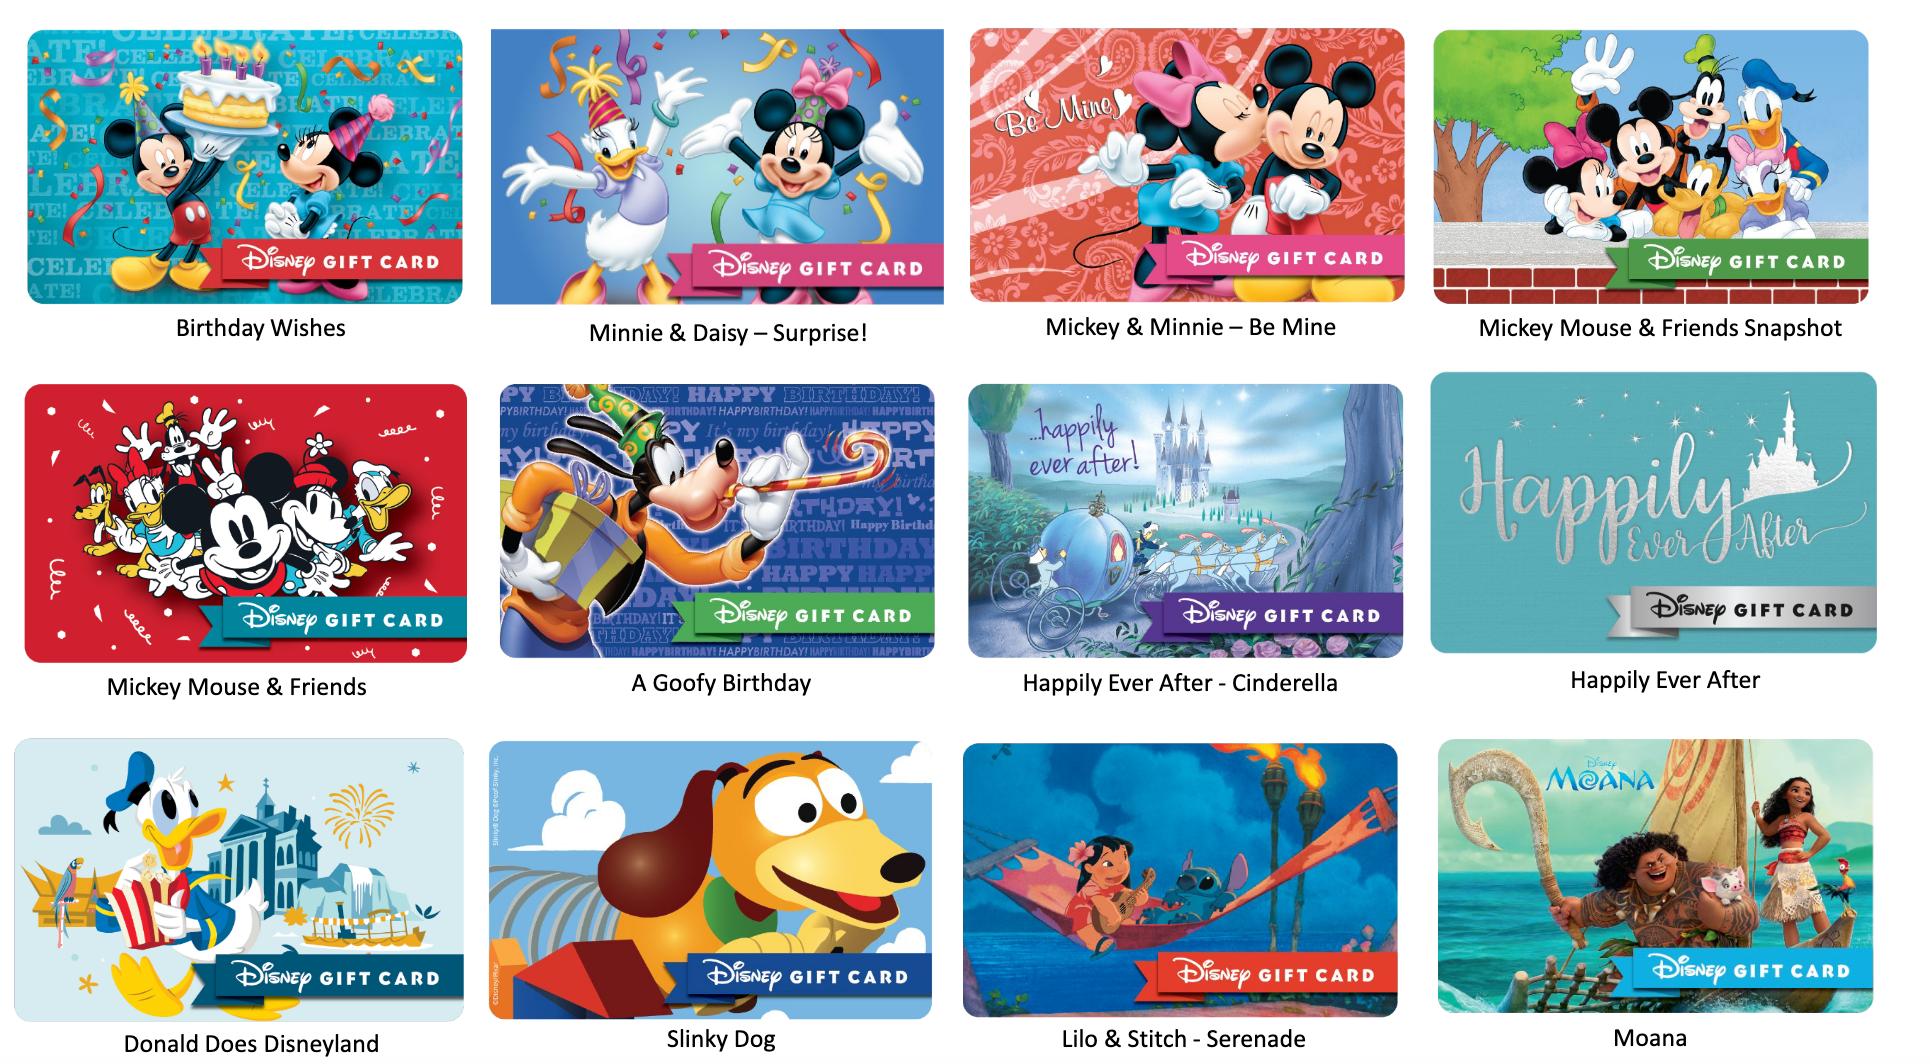 ShopDisney, Disney Gift Cards, Mickey and pals, Lilo, Moana